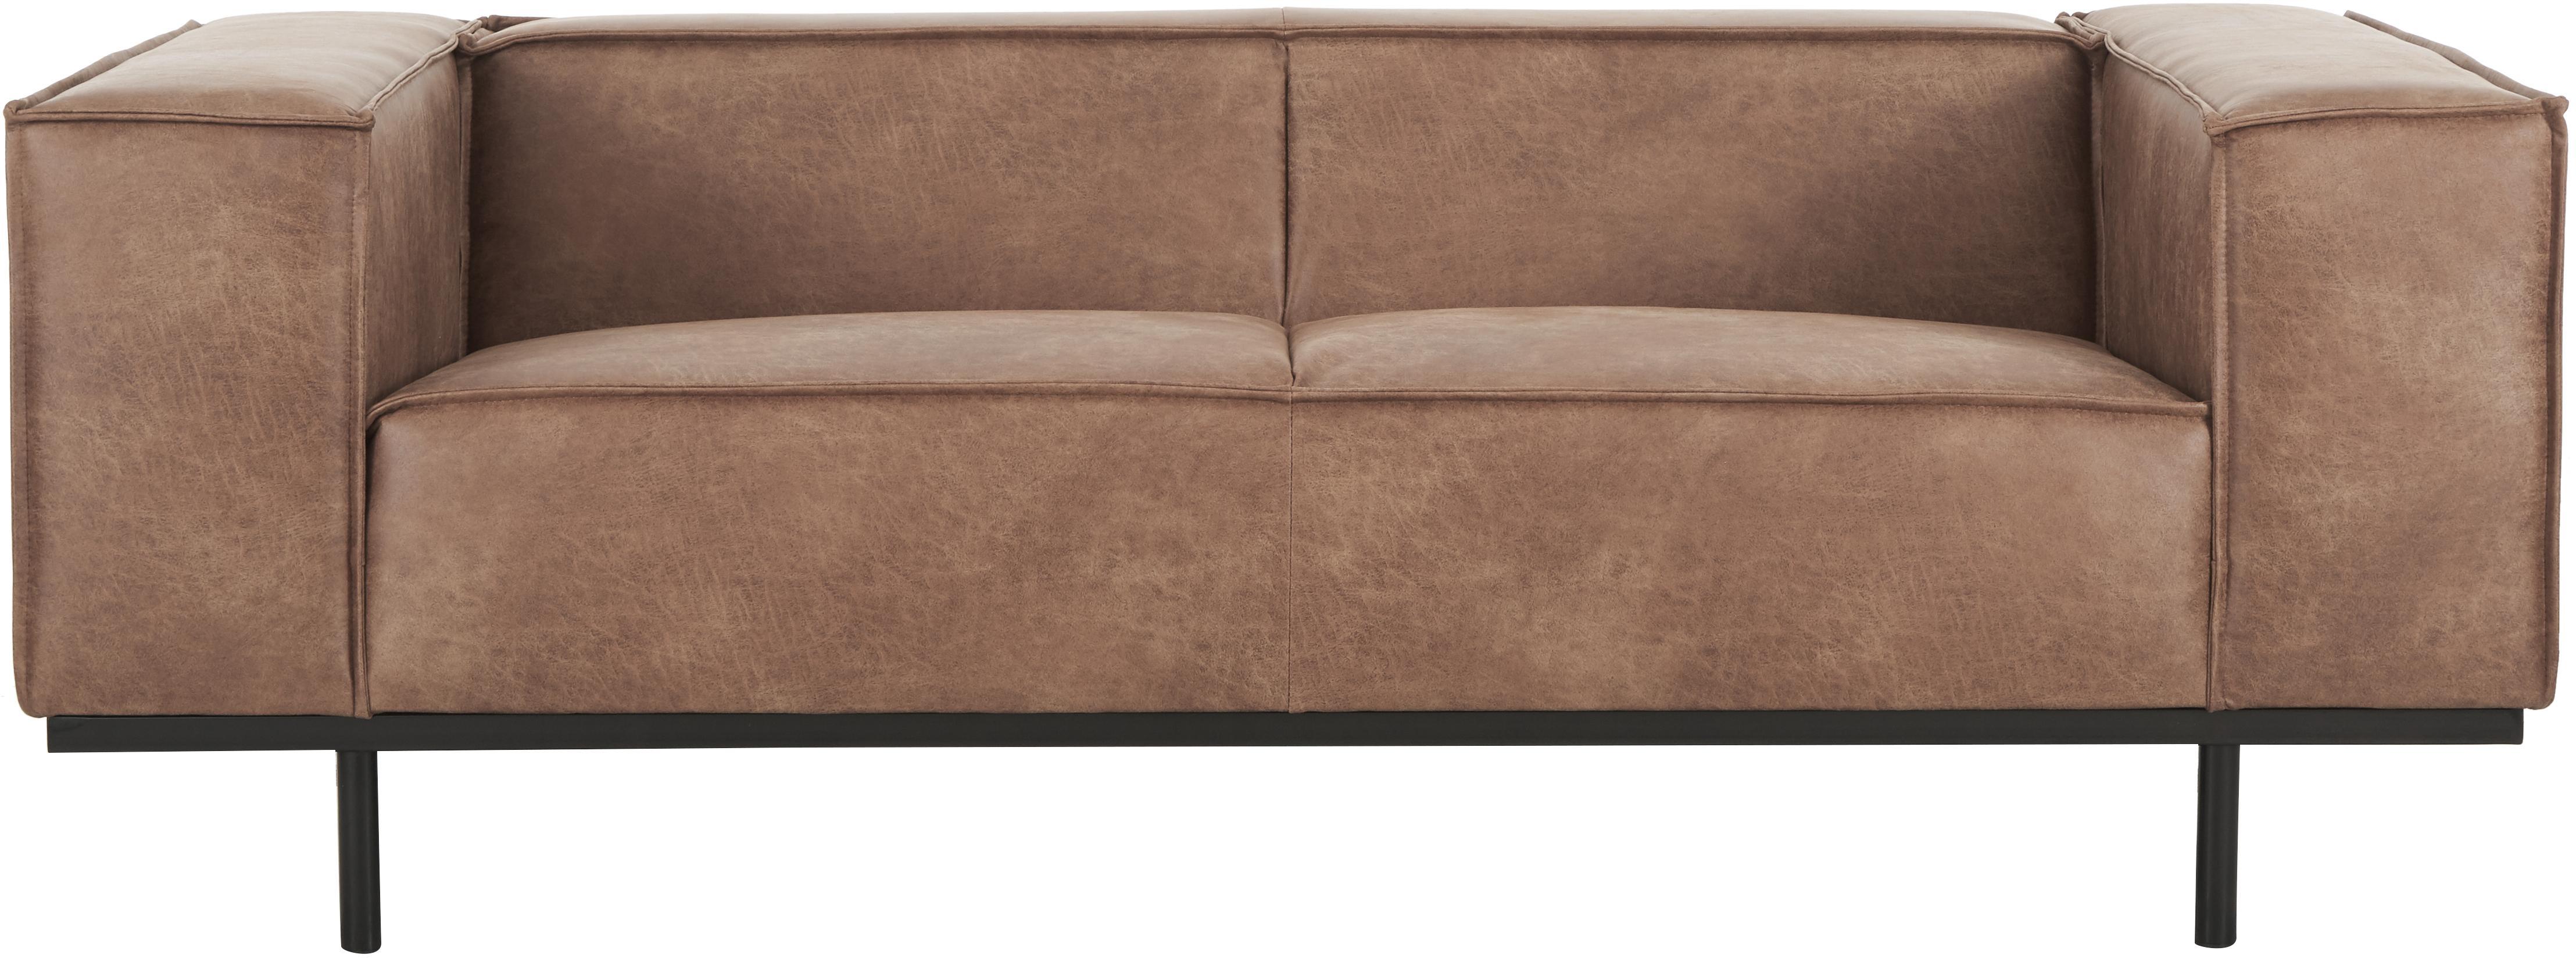 Leder-Sofa Abigail (2-Sitzer), Bezug: Lederfaserstoff (70% Lede, Beine: Stahl, lackiert, Leder Braun, B 190 x T 95 cm